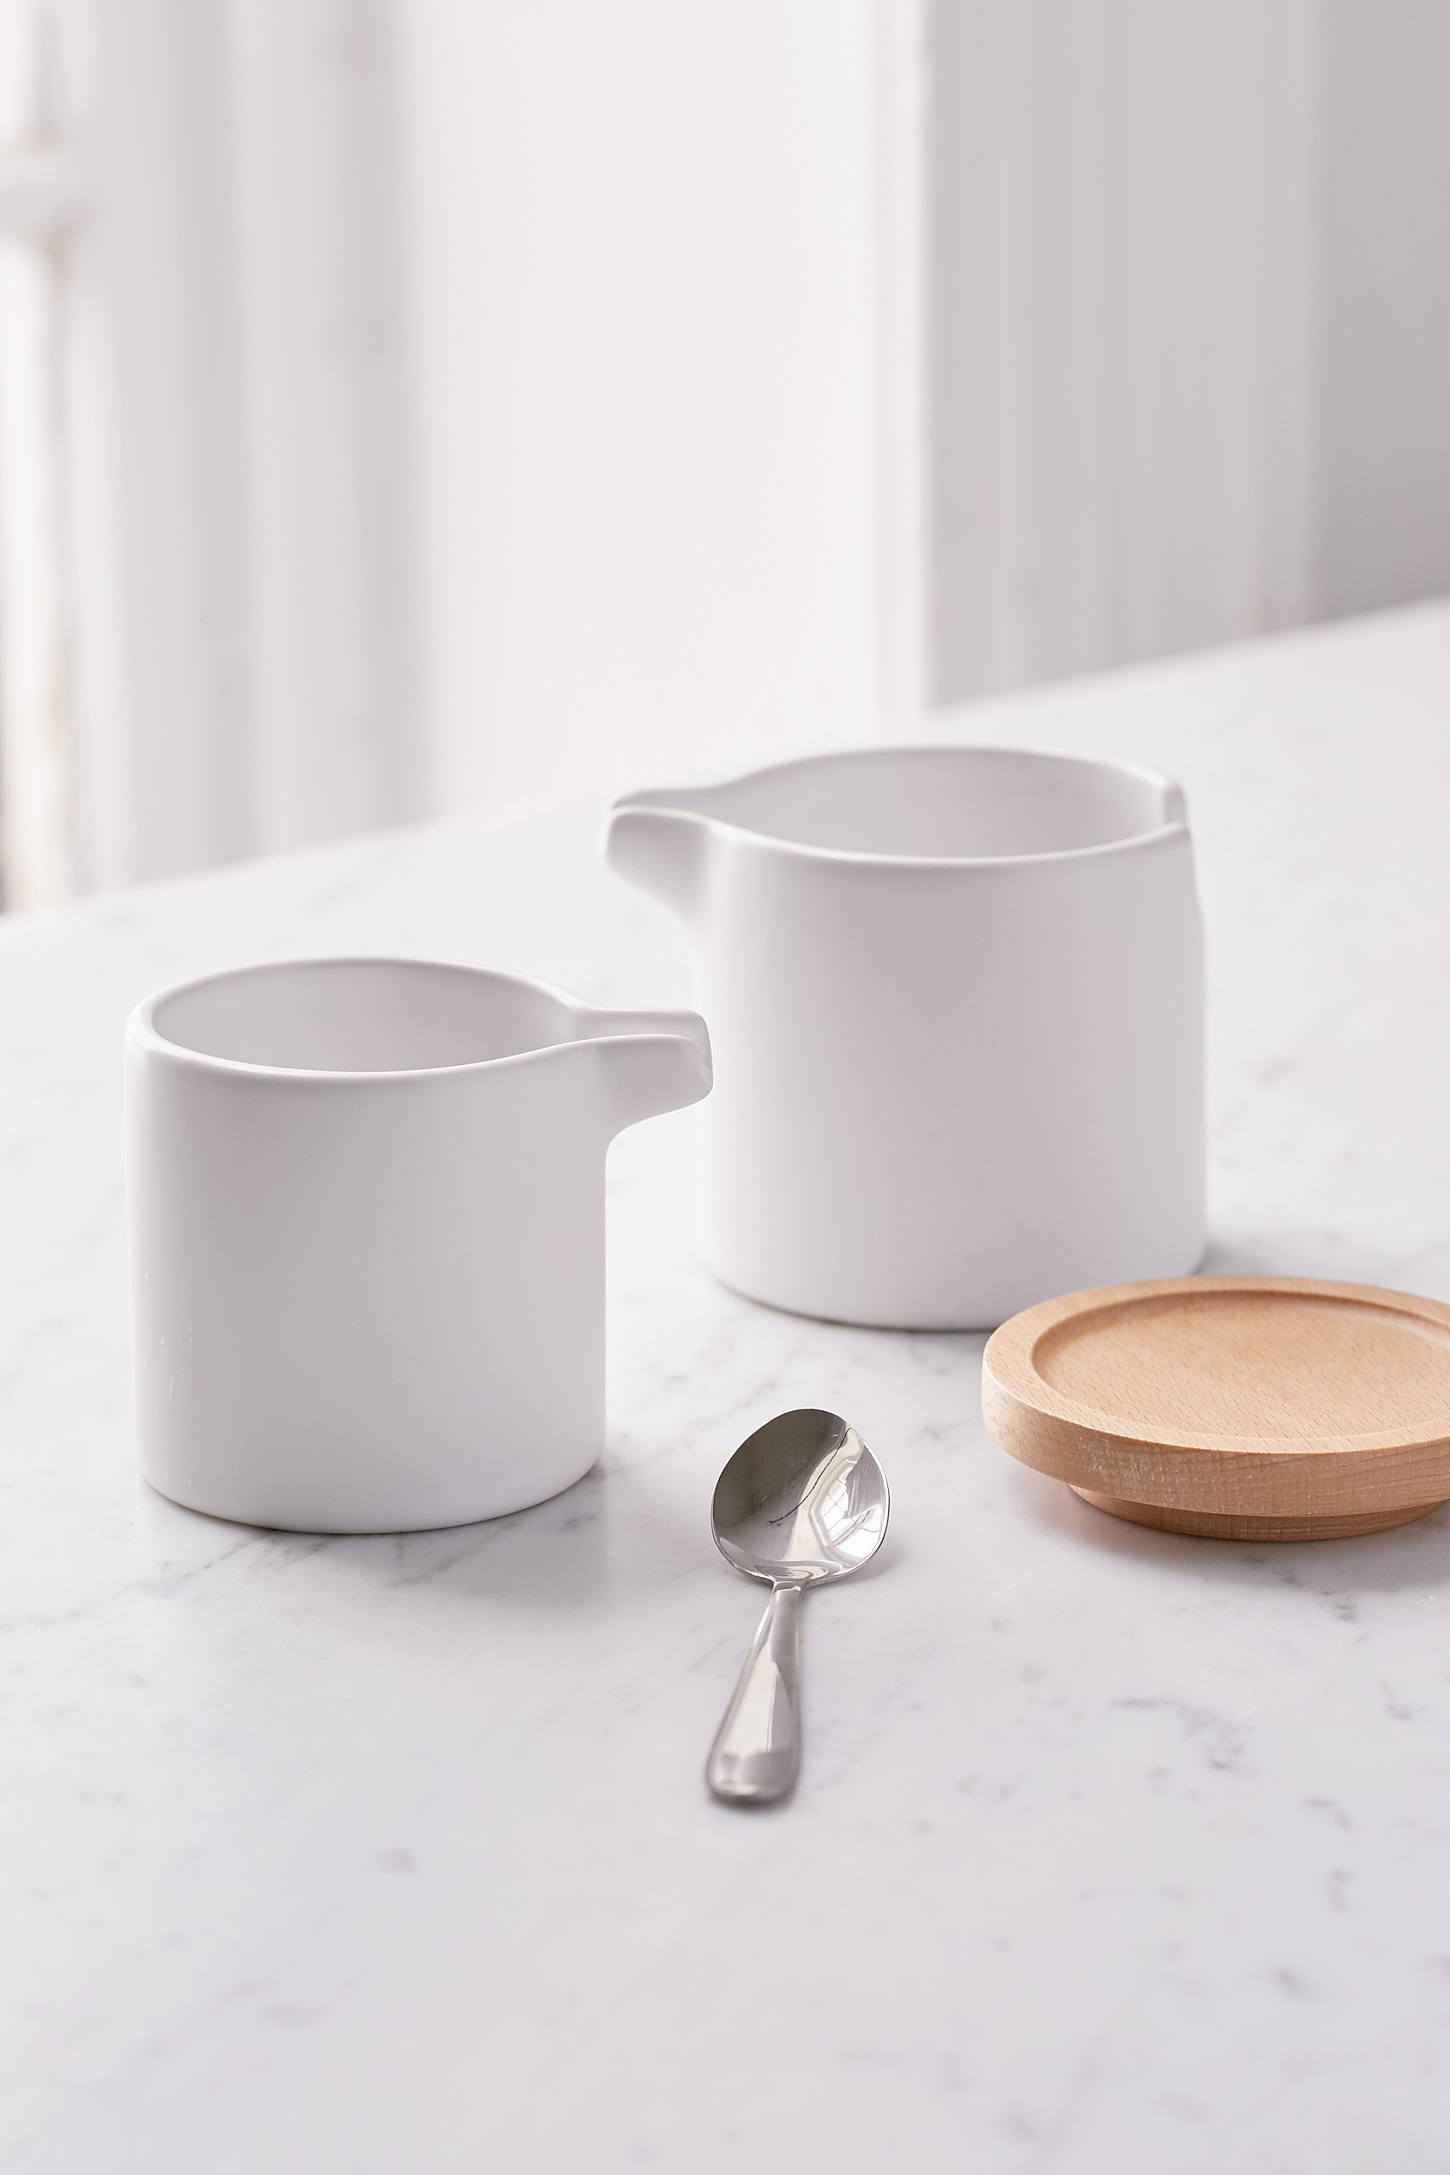 nesting cream  sugar dish set  urban outfitters - slide view  nesting cream  sugar dish set